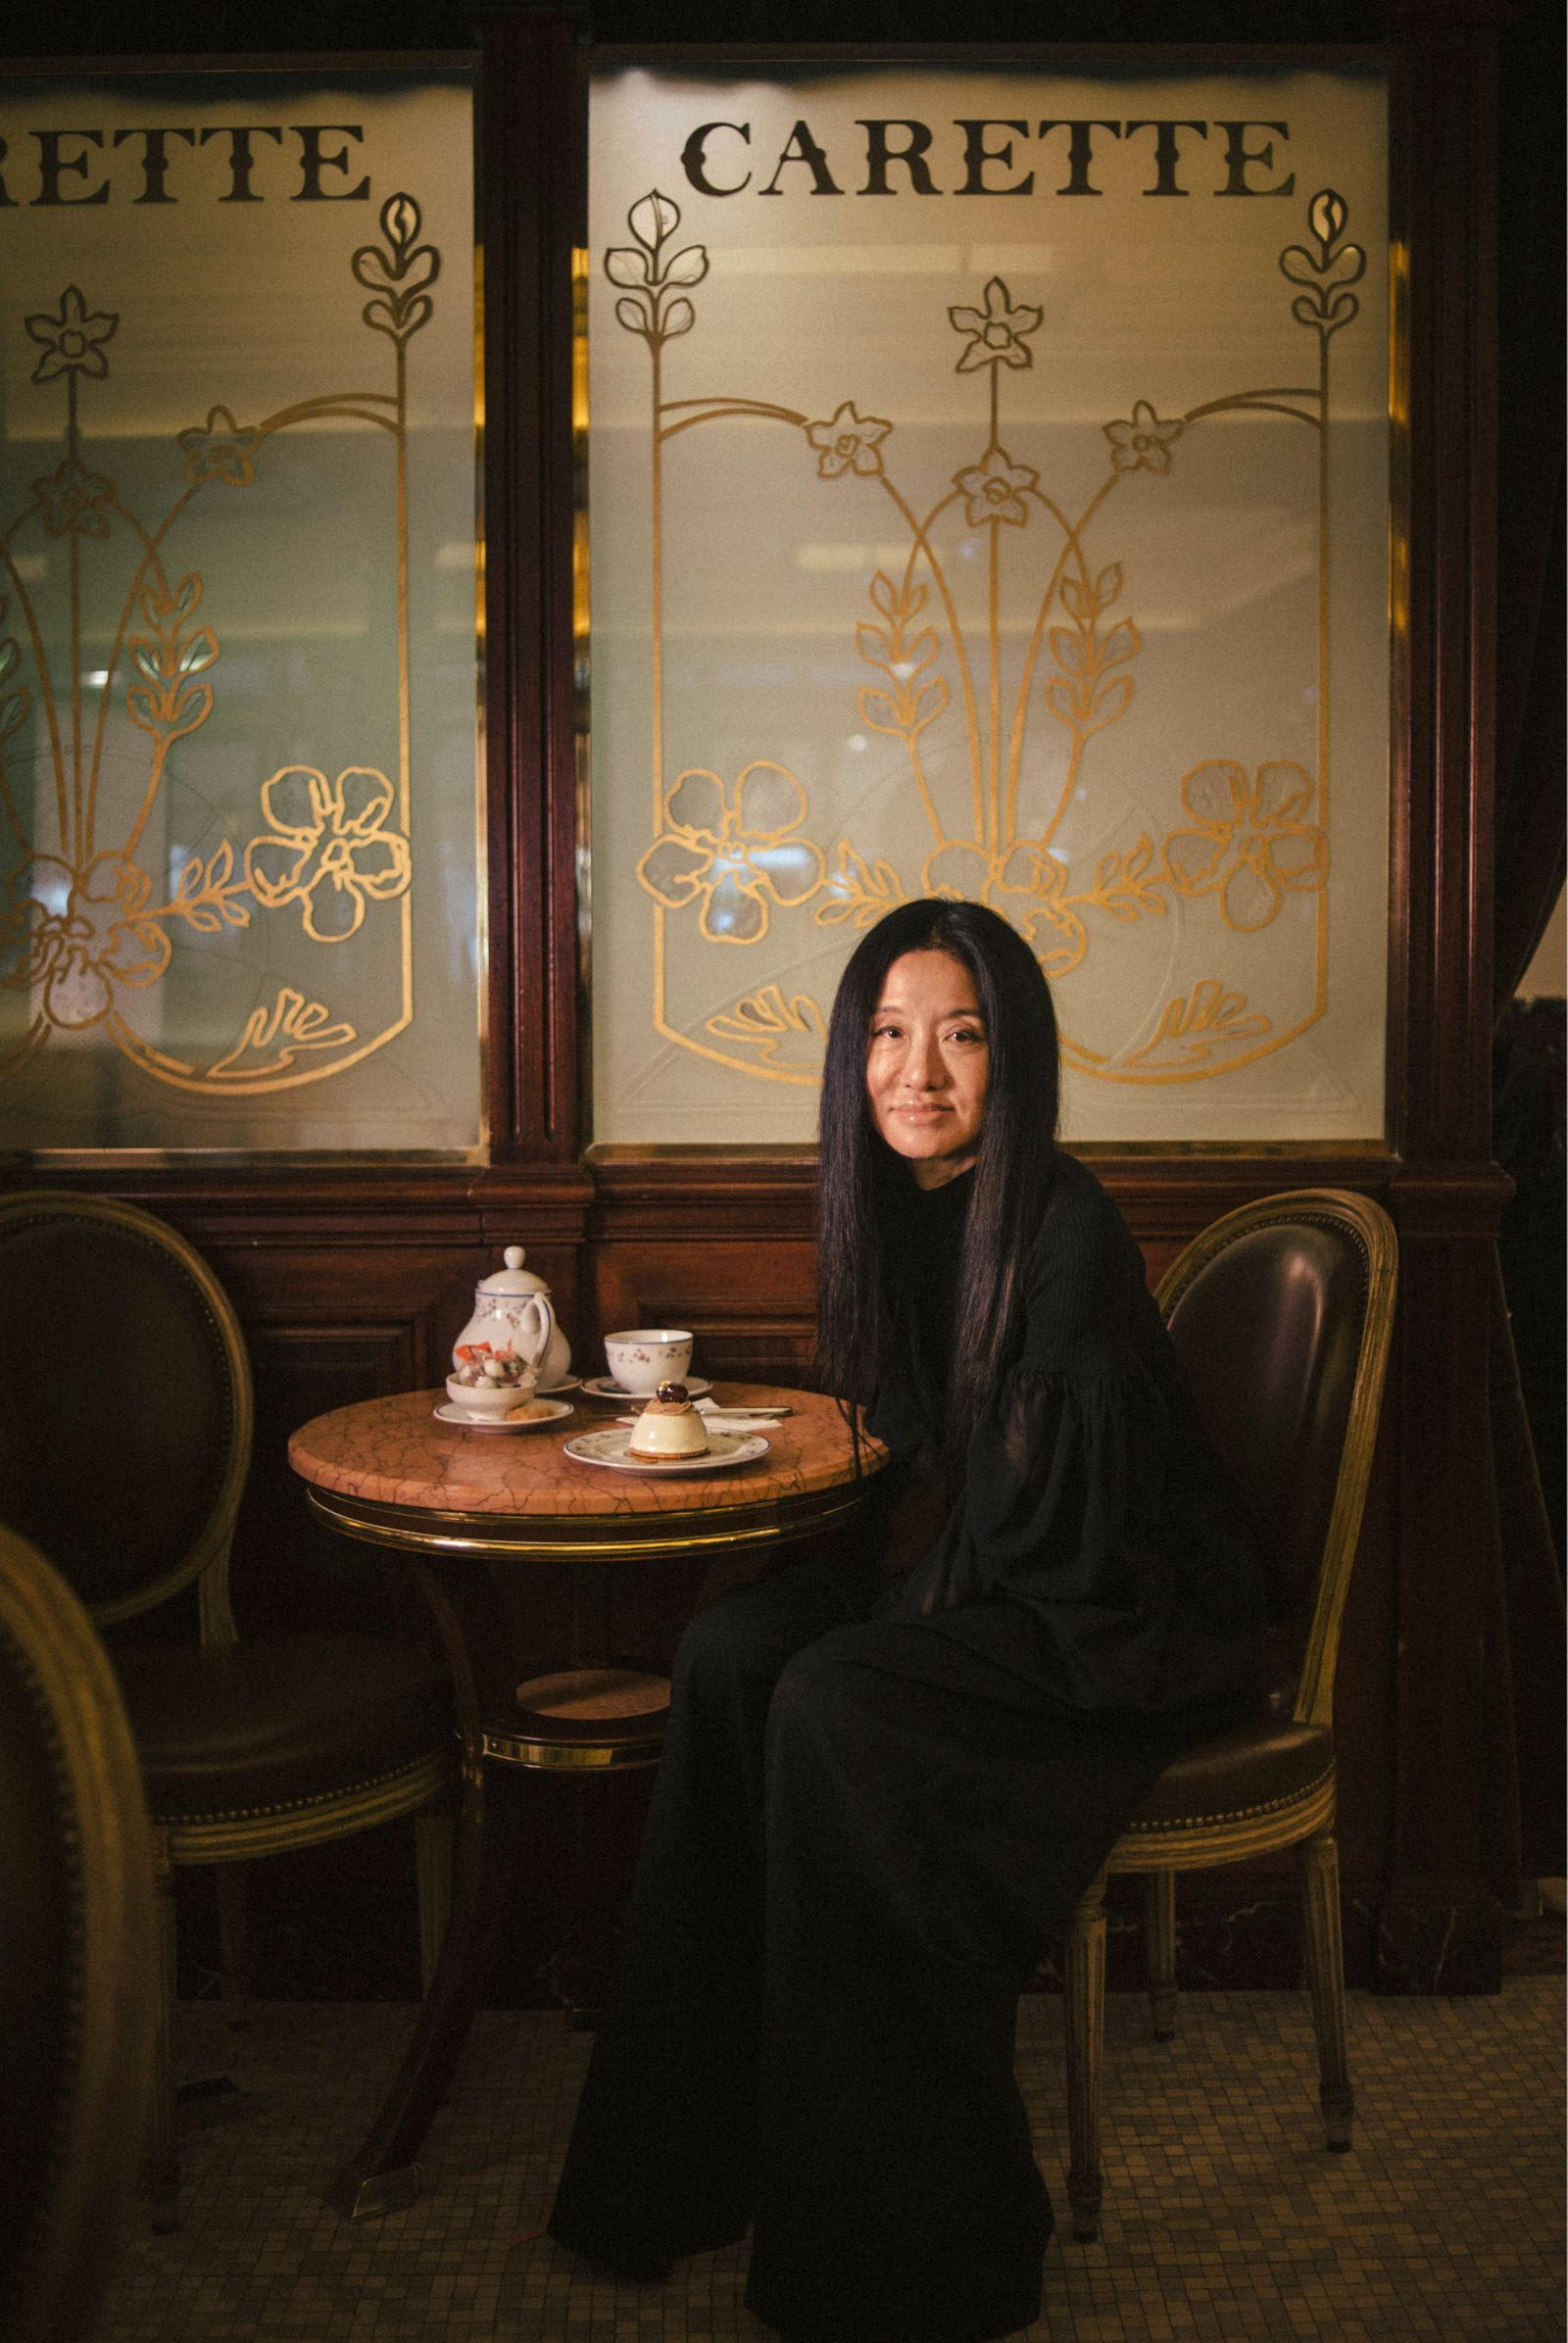 Vera Wang, the fashion designer, at Chez Carette in Paris.